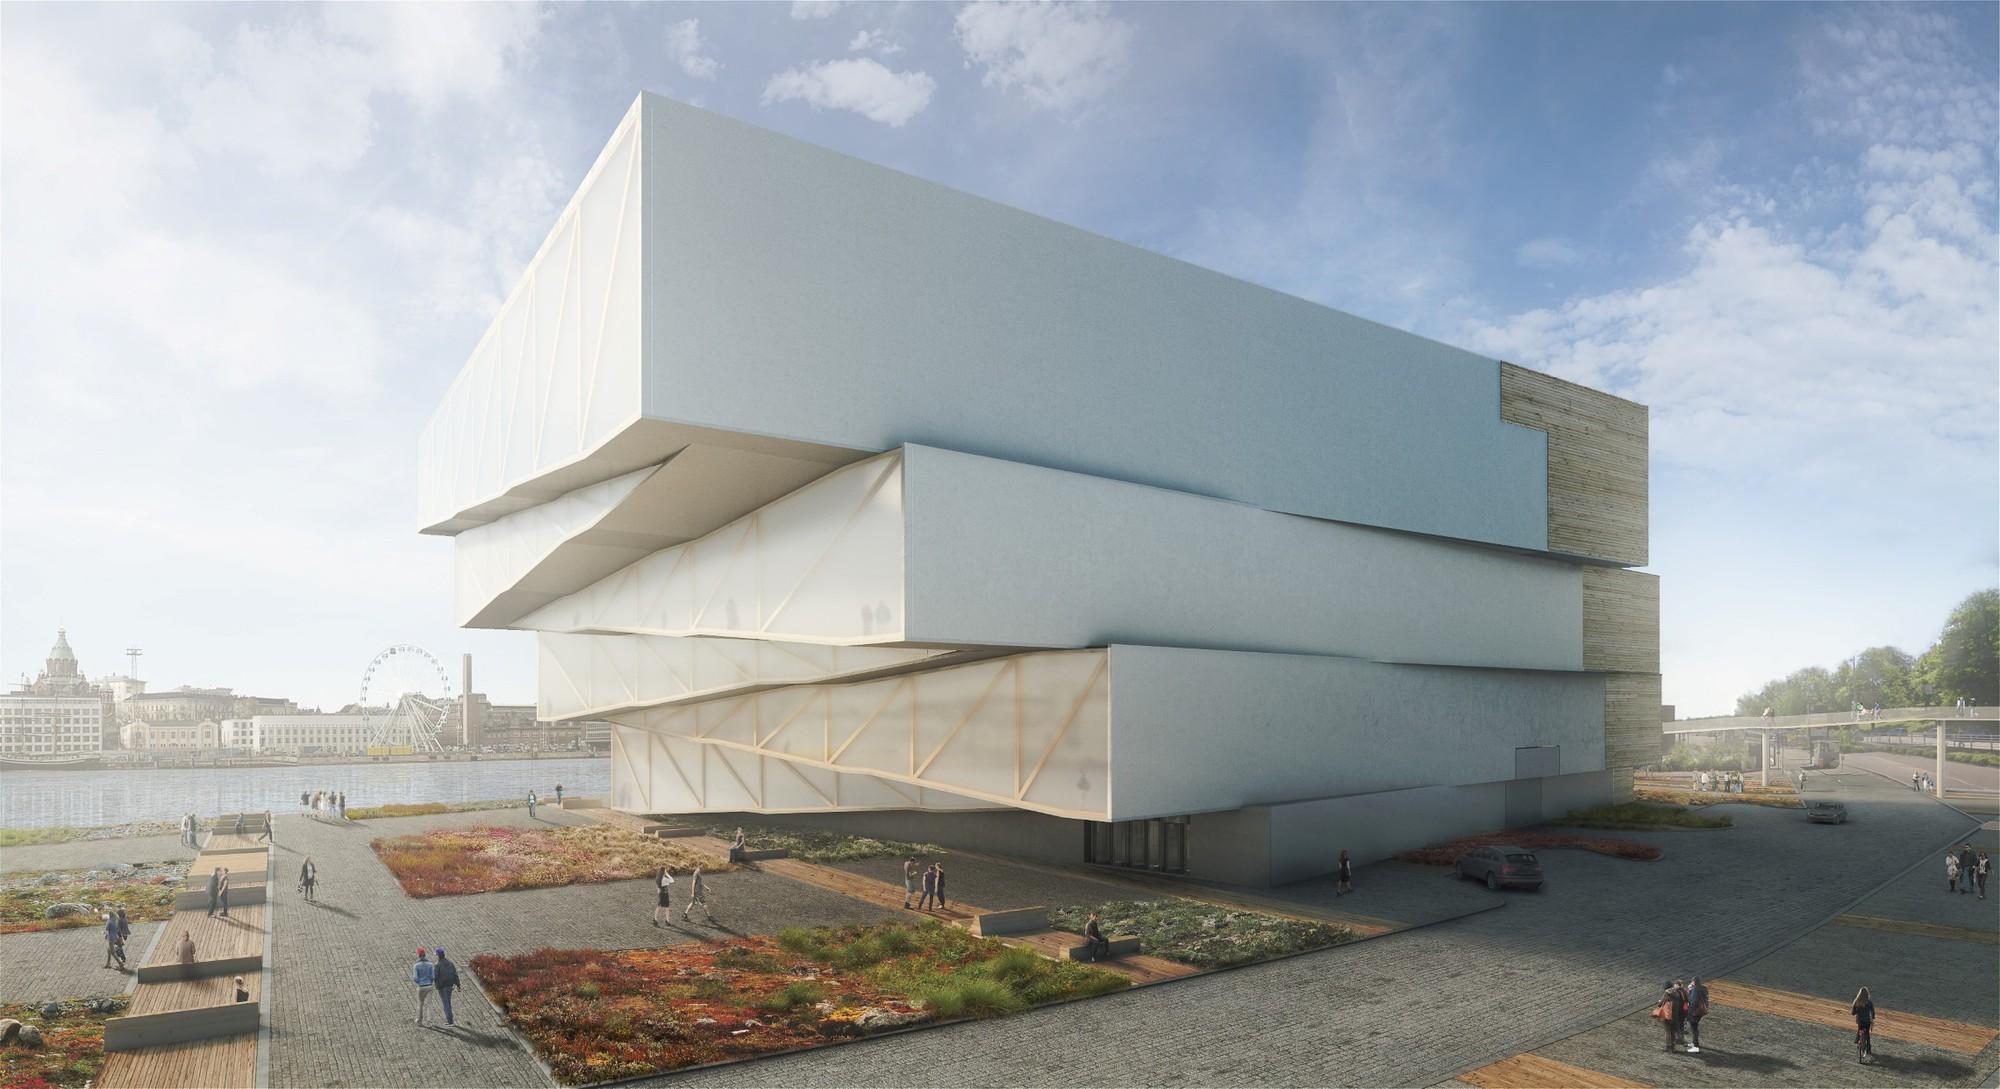 Proposta para o Museu Guggenheim Helsinki / Vazio S/A, Cortesia de Vazio S/A, EdiT Studio